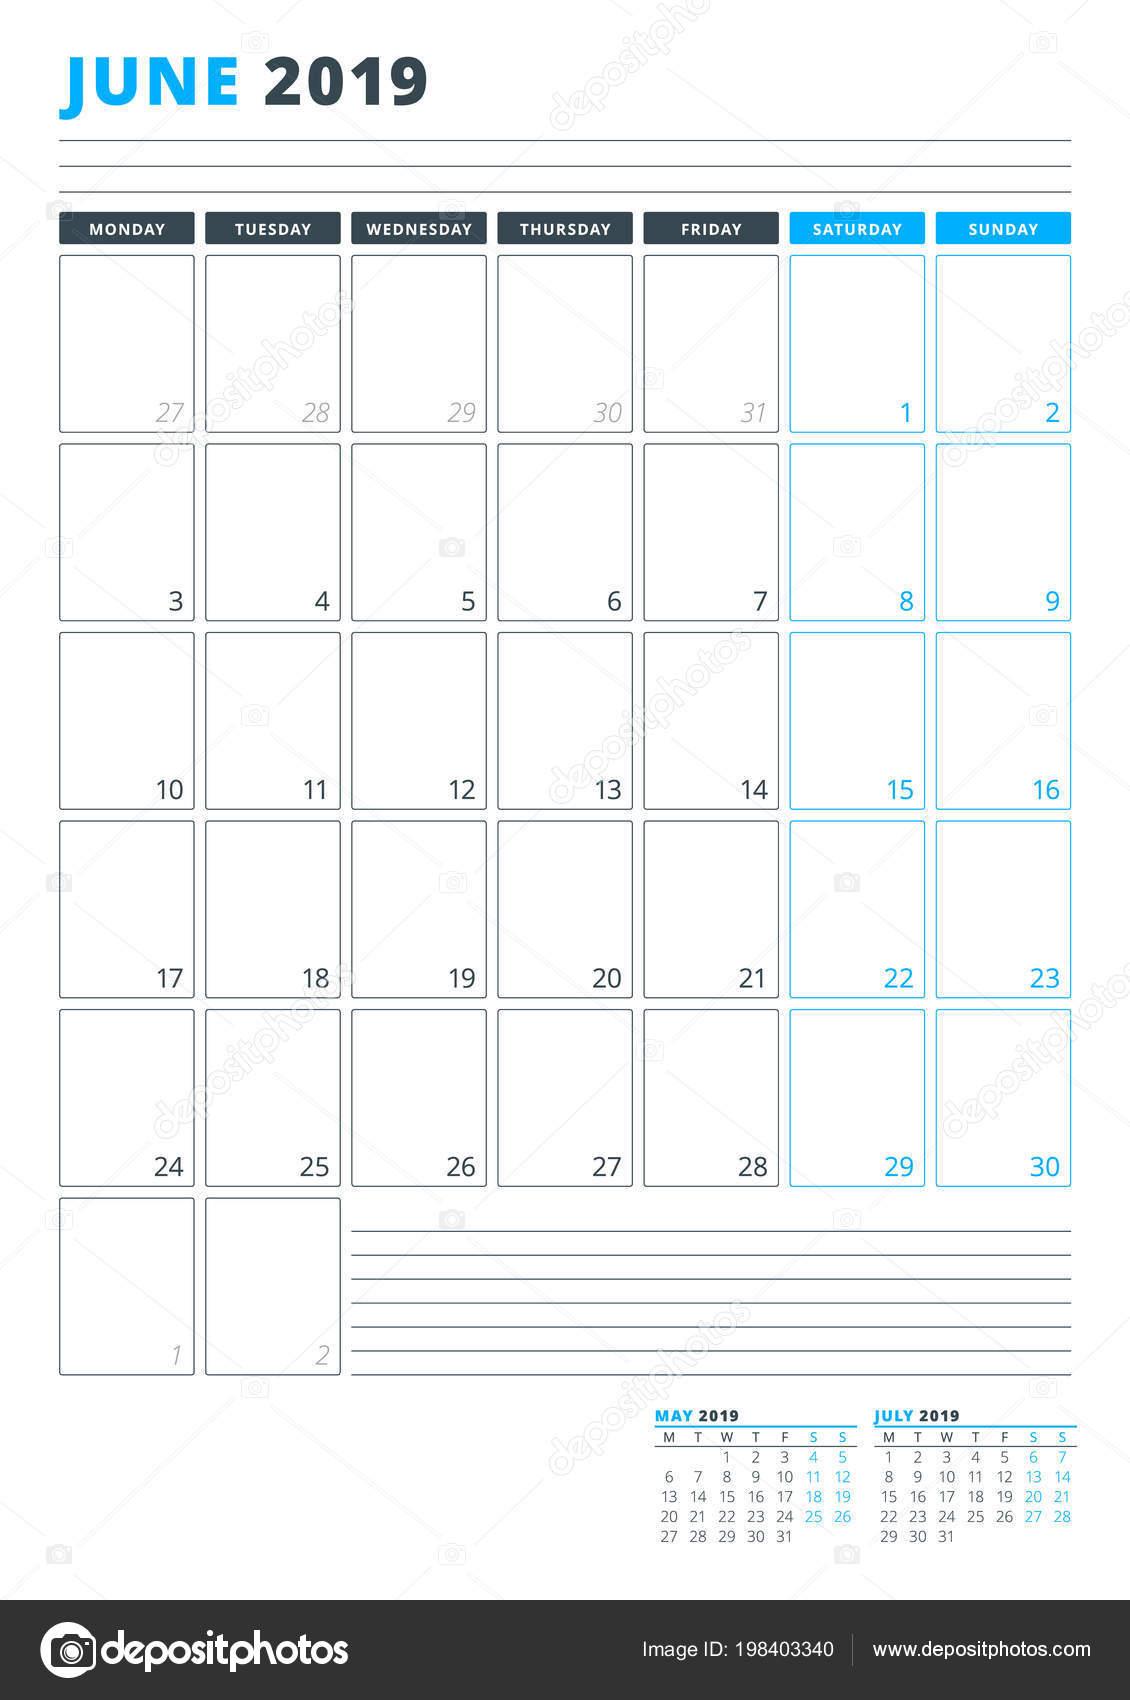 2019 júniusi naptár Naptár Sablon Június 2019 Üzleti Tervező Sablon Levélpapír Hét  2019 júniusi naptár